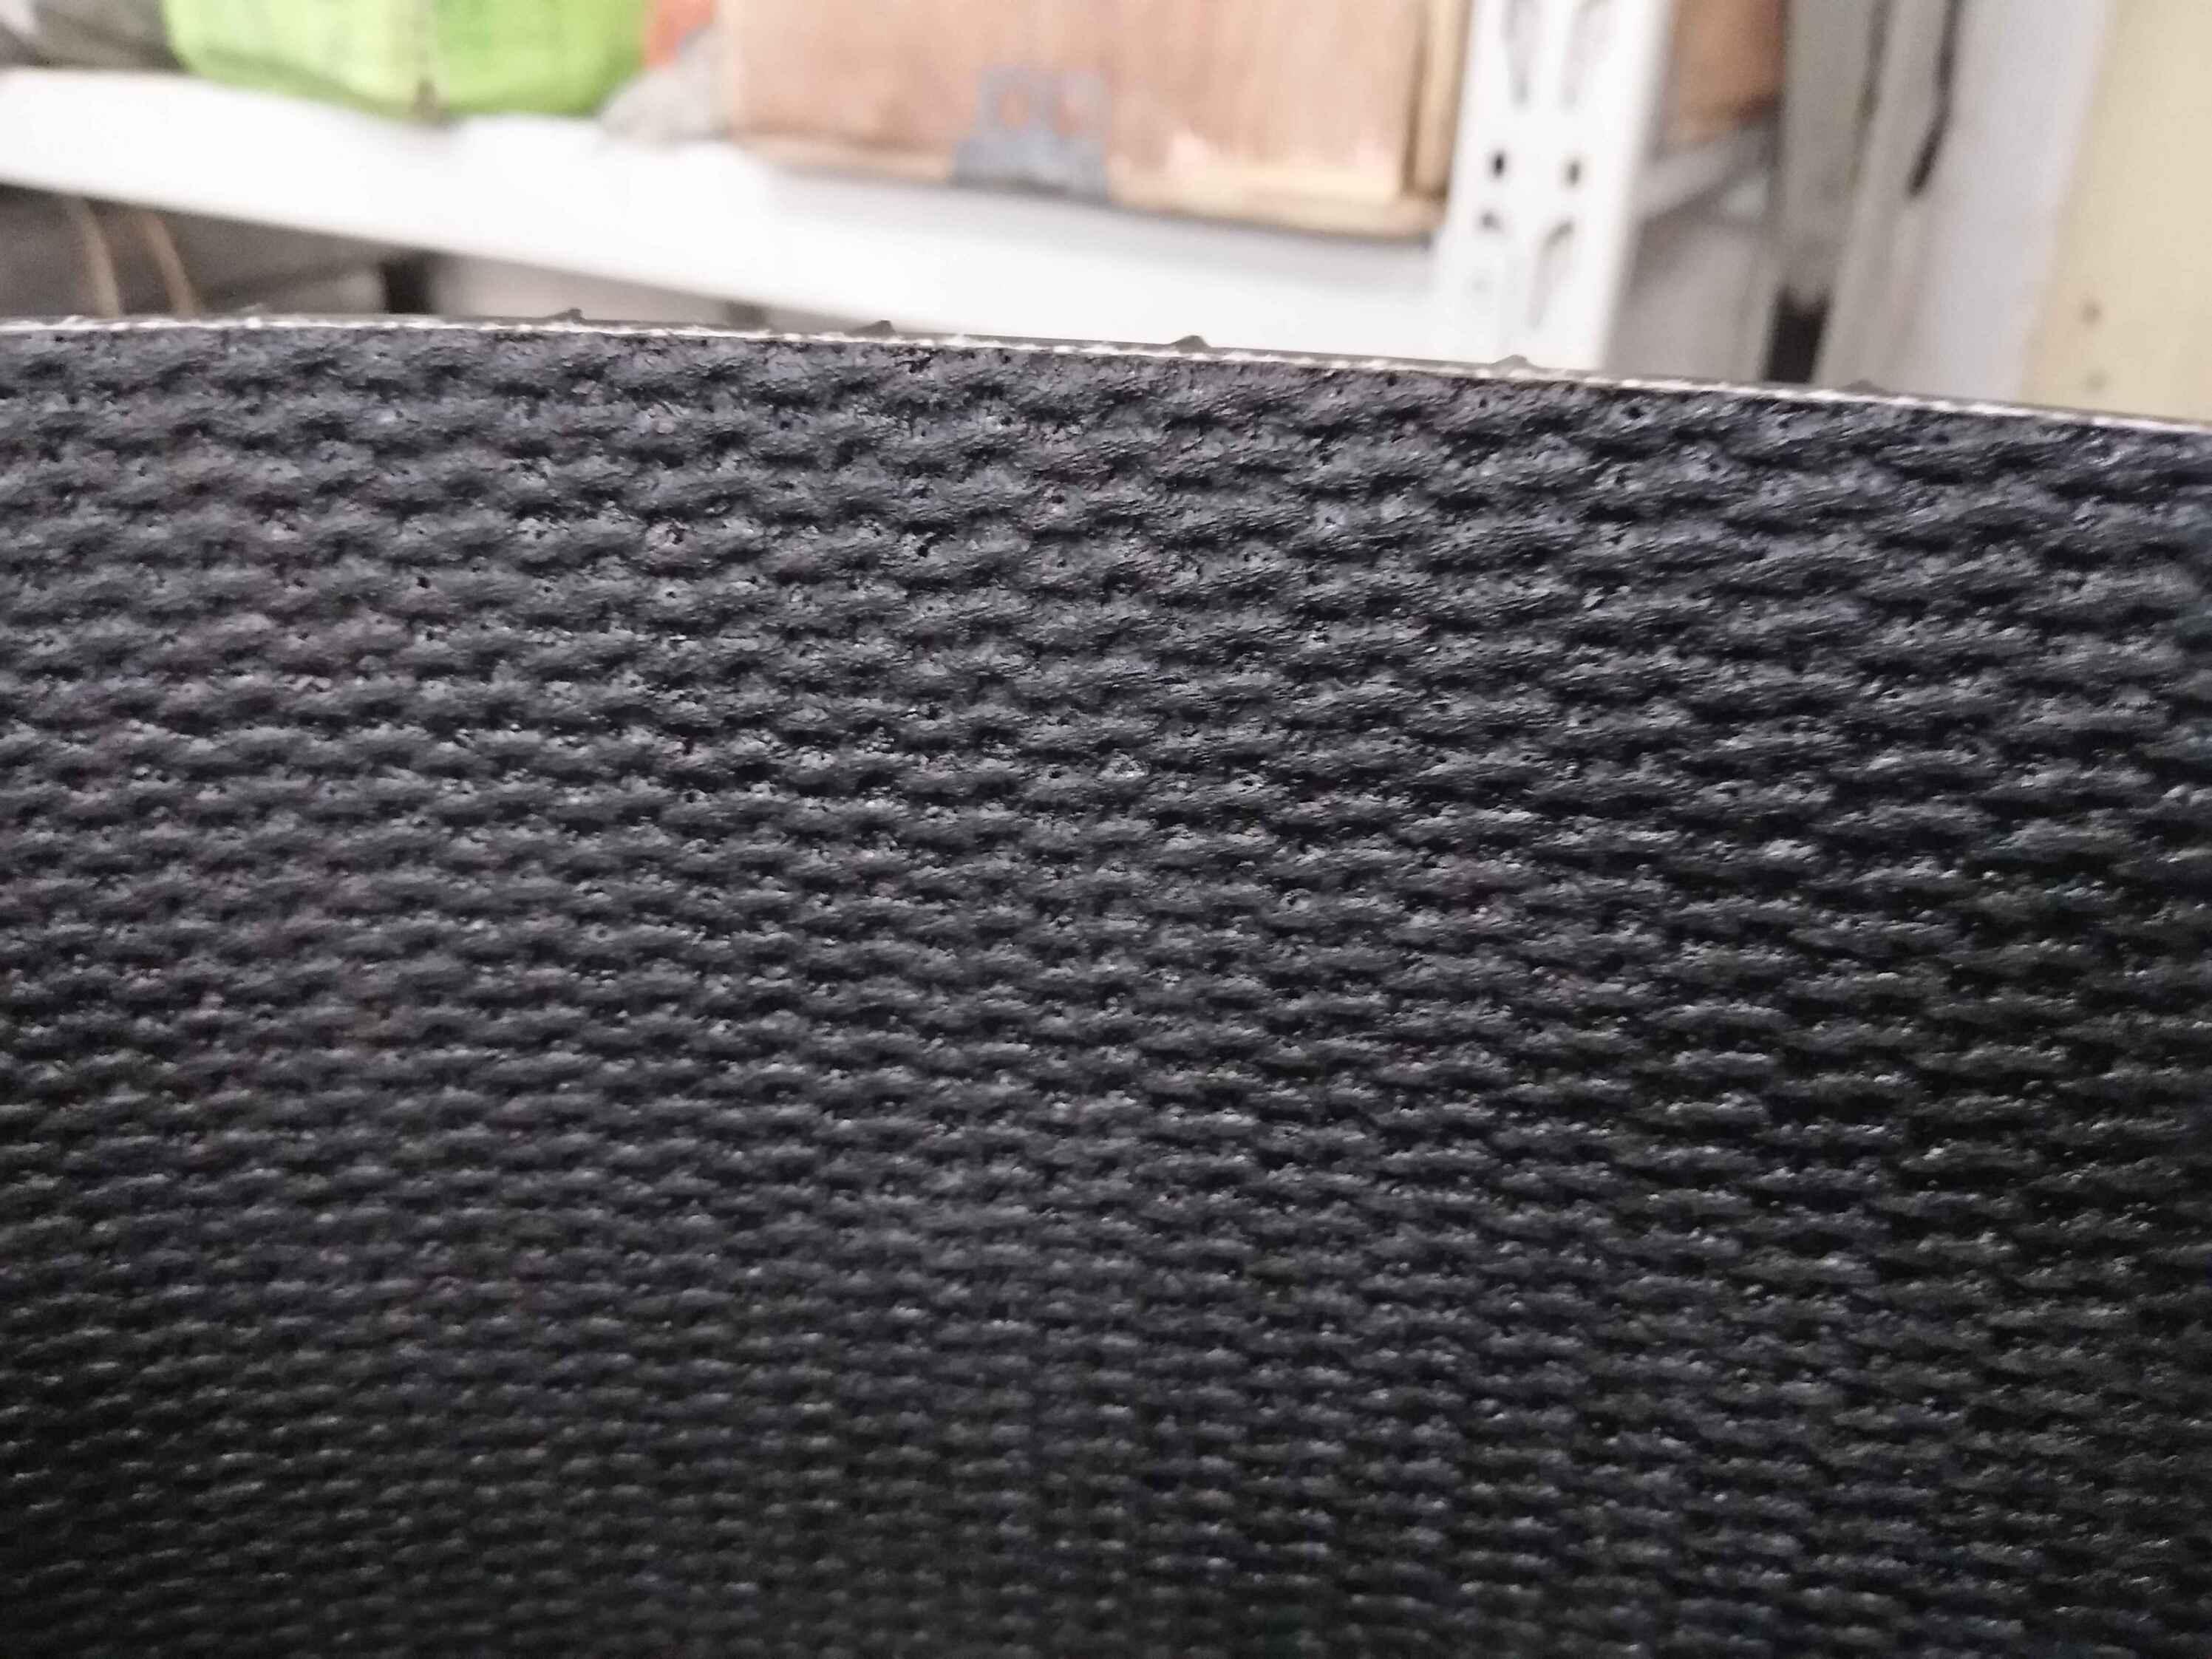 Crescent top chevron - PVK conveyor belt with PU surface